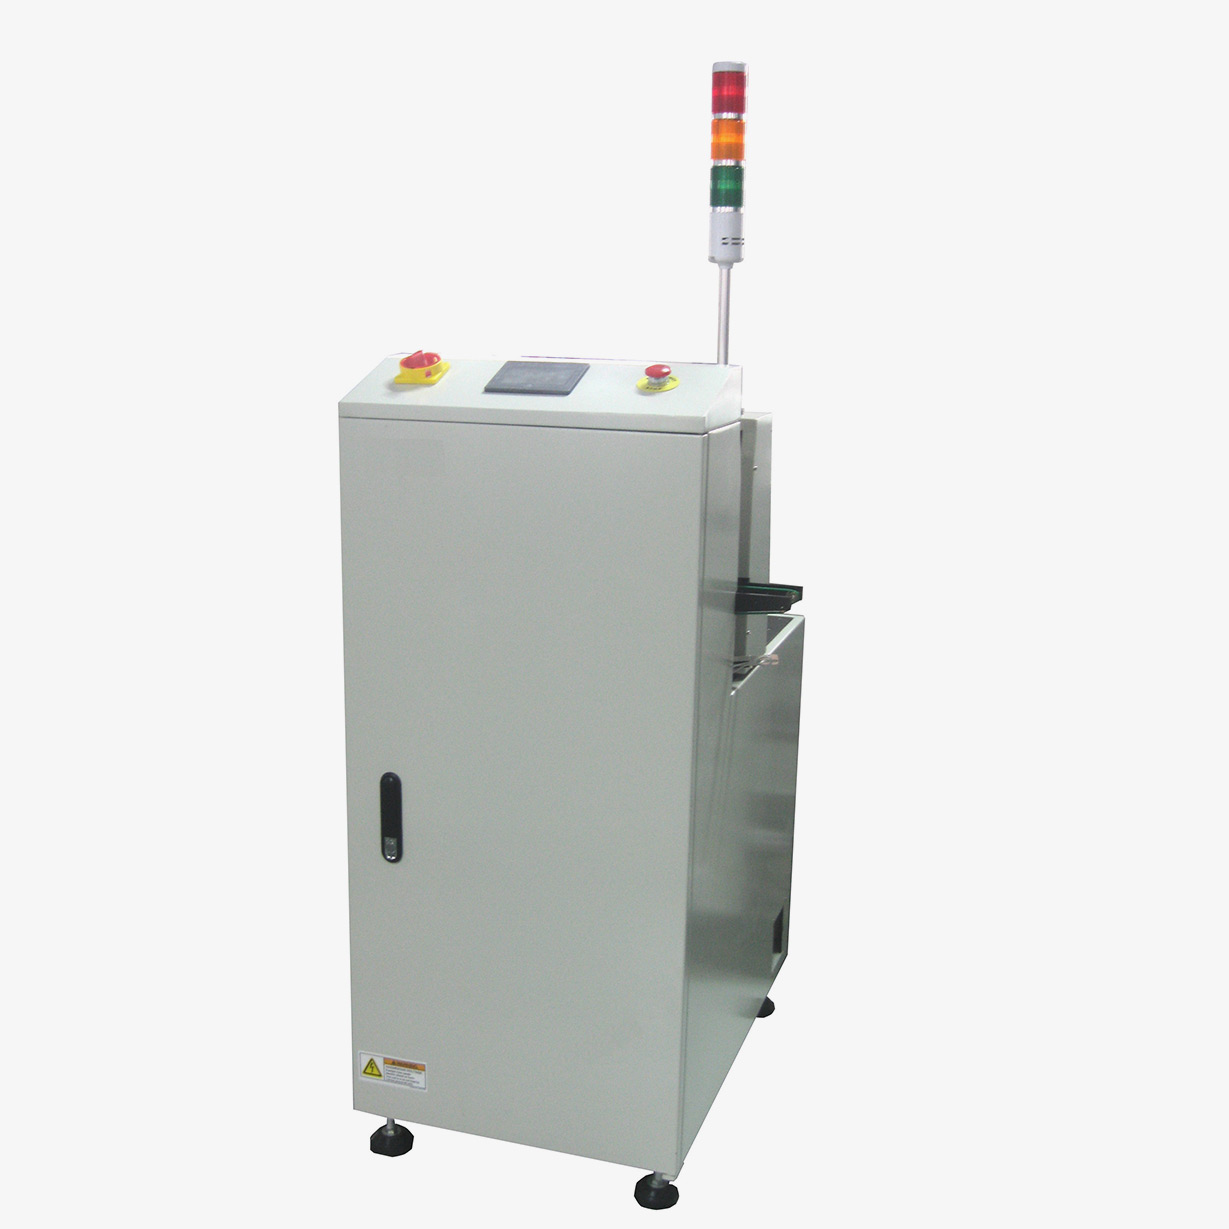 PCB Destacker - Adtool Corporation - Distributor of